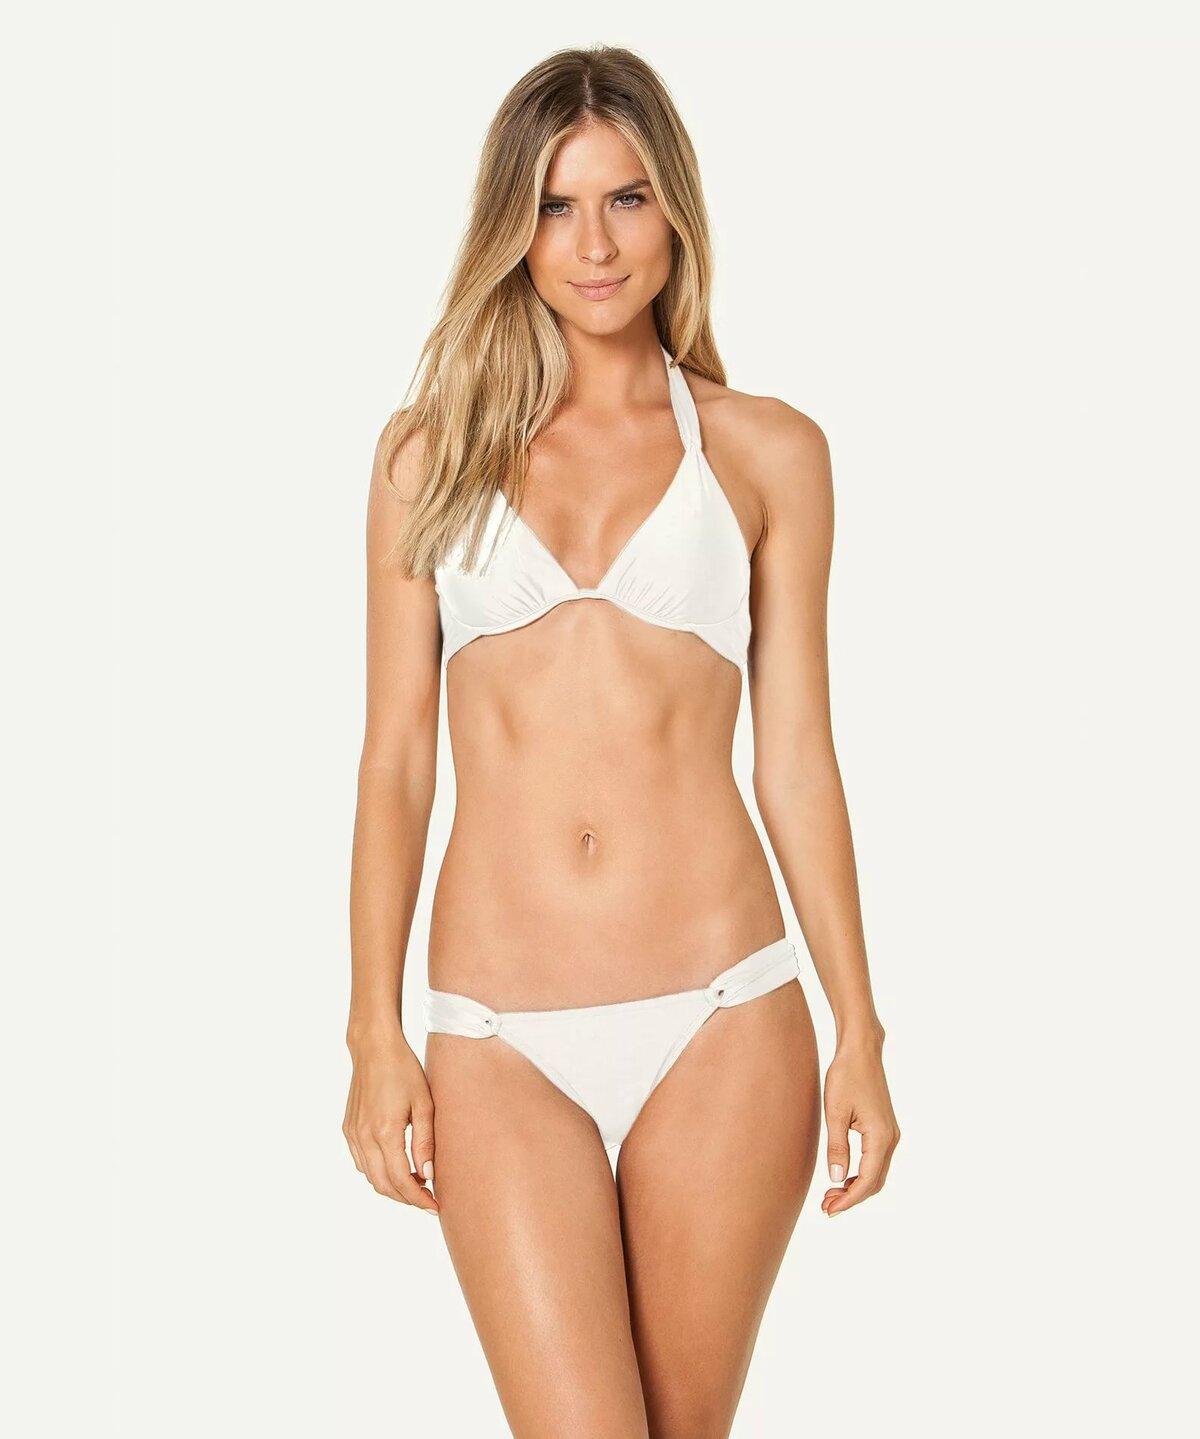 What size bikini